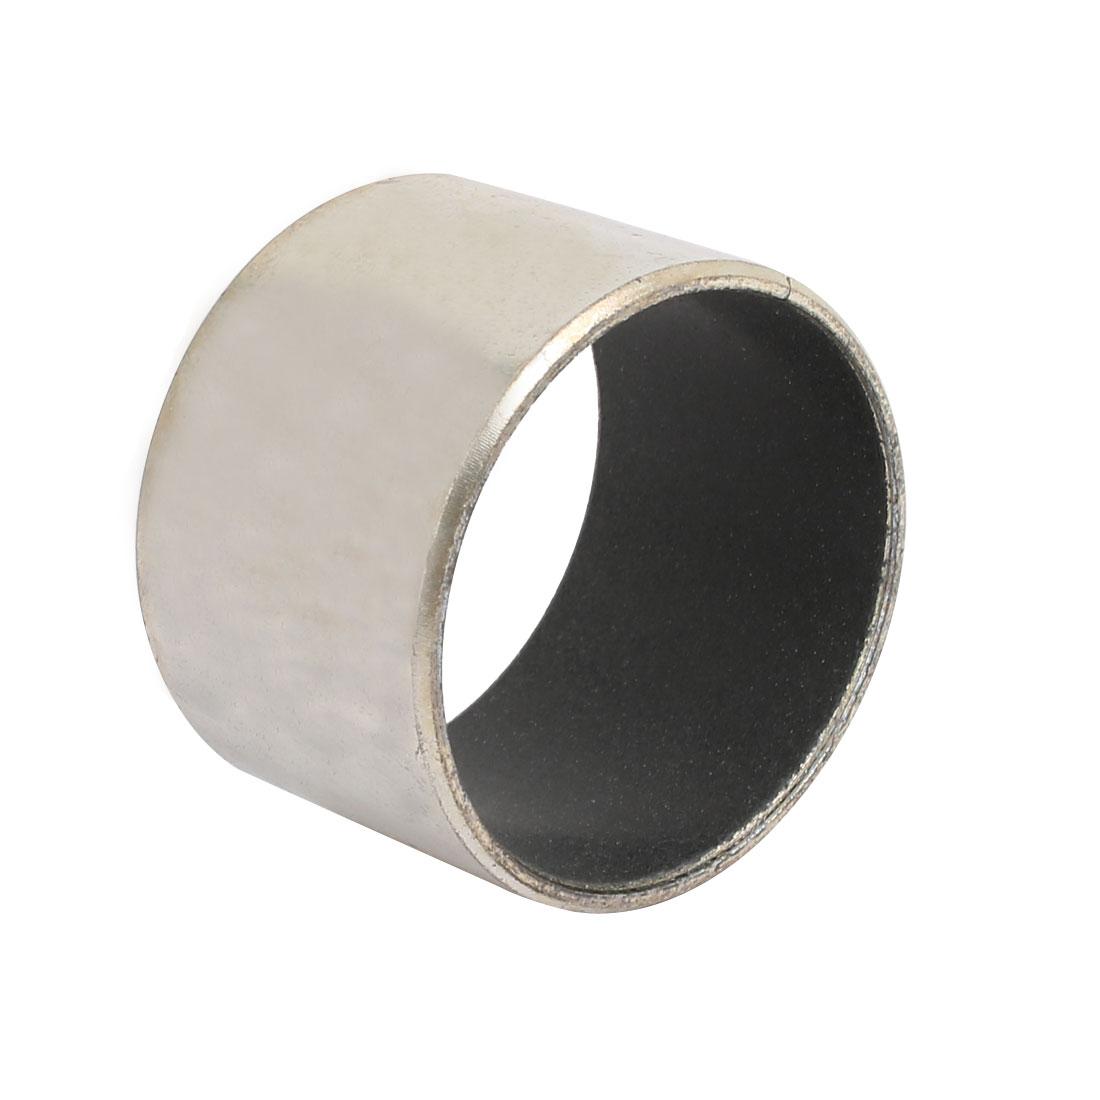 40mm x 30mm Self-lubricating Composite Bearing Bushing Sleeve Silver Tone